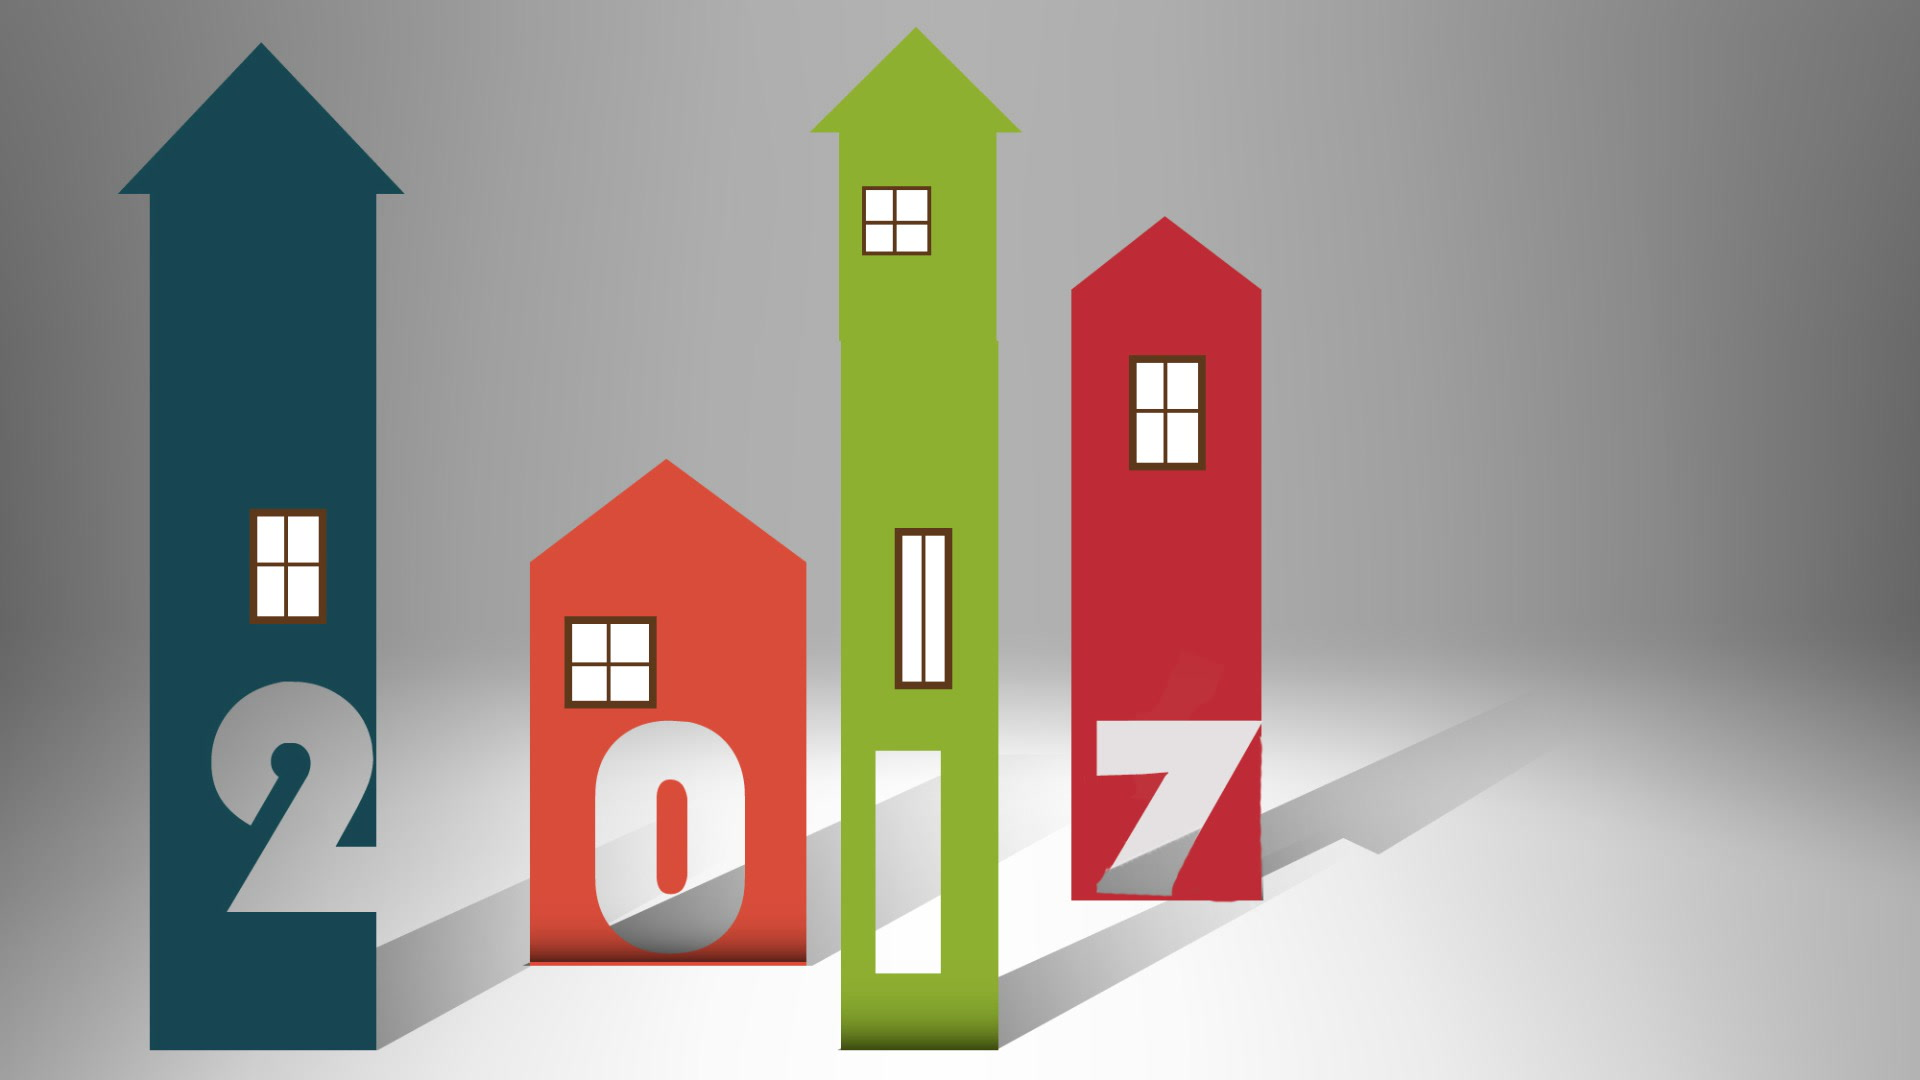 2017_maricopa_county_real_estate_market.jpg